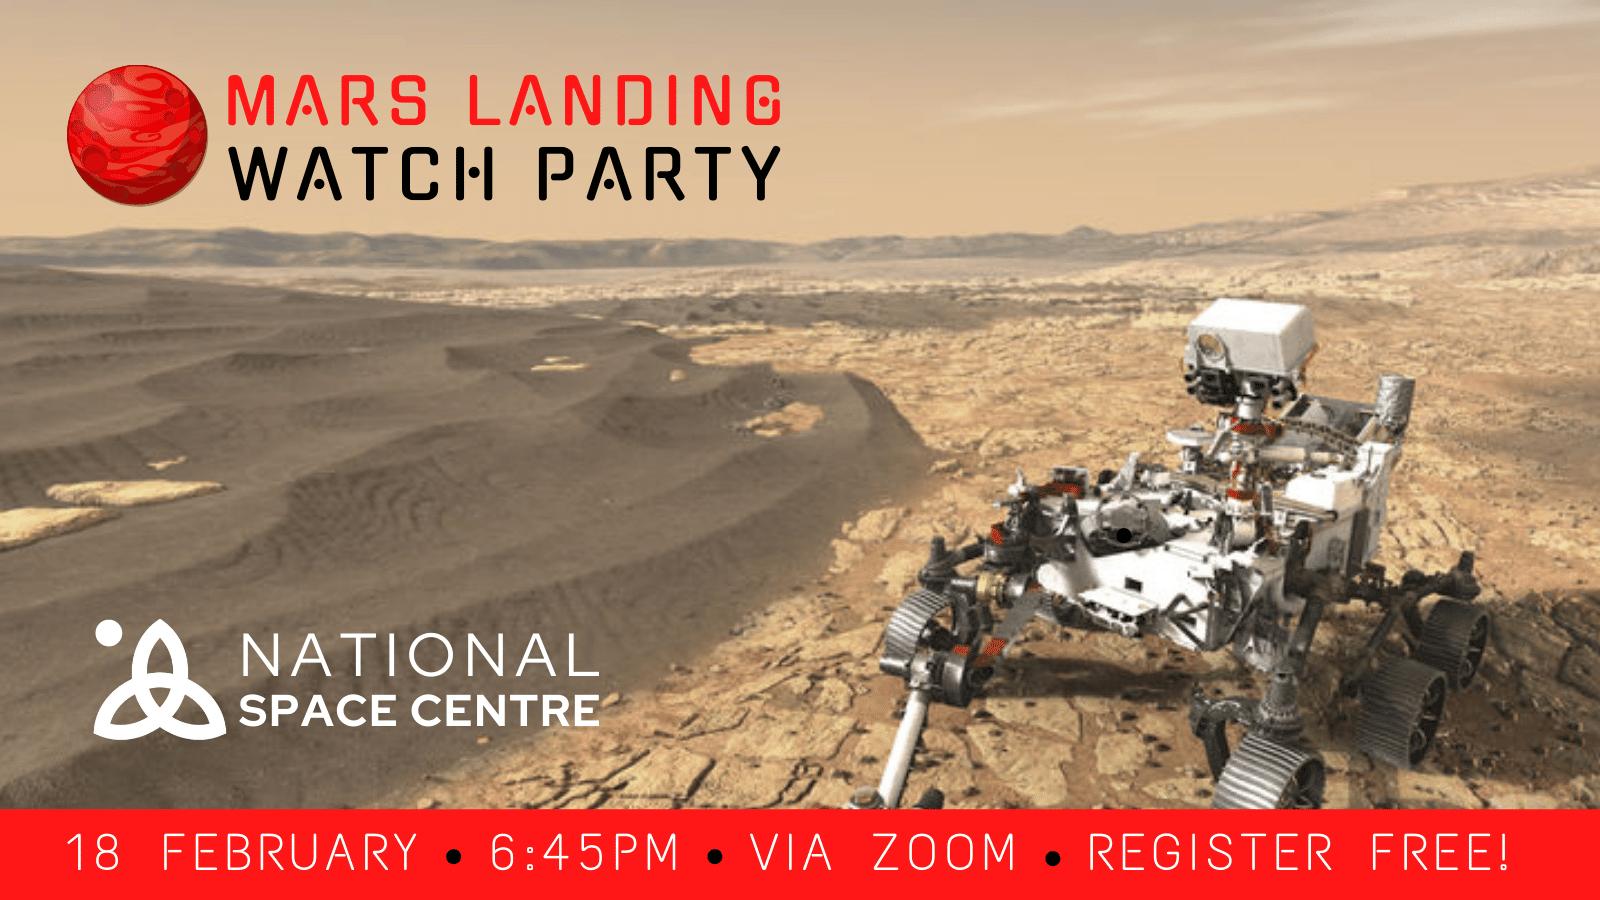 Mars Landing Watch Party